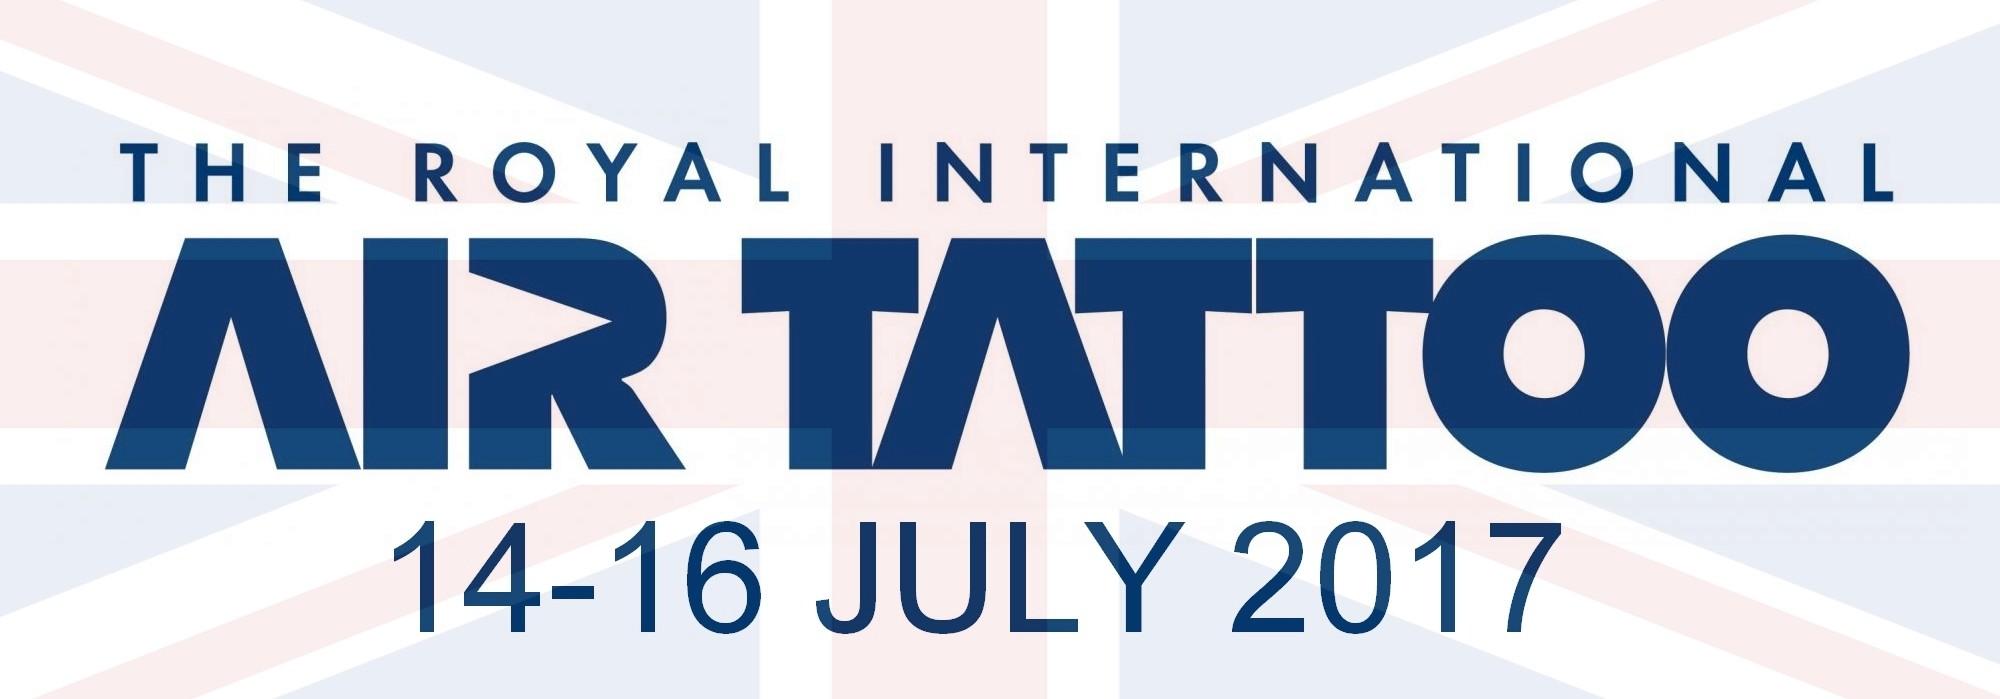 RIAT 2017 , airtattoo , U.S.A.F. Thunderbirds , meeting aerien 2017 , airshow 2017 , July 14-16 , Royal International Air Tattoo 2017 , spotter day 2017 , aircraft , fairford , Royal International Air Tattoo (RIAT) 2017 , Angleterre , UK , Manifestation Aeriennes 2017